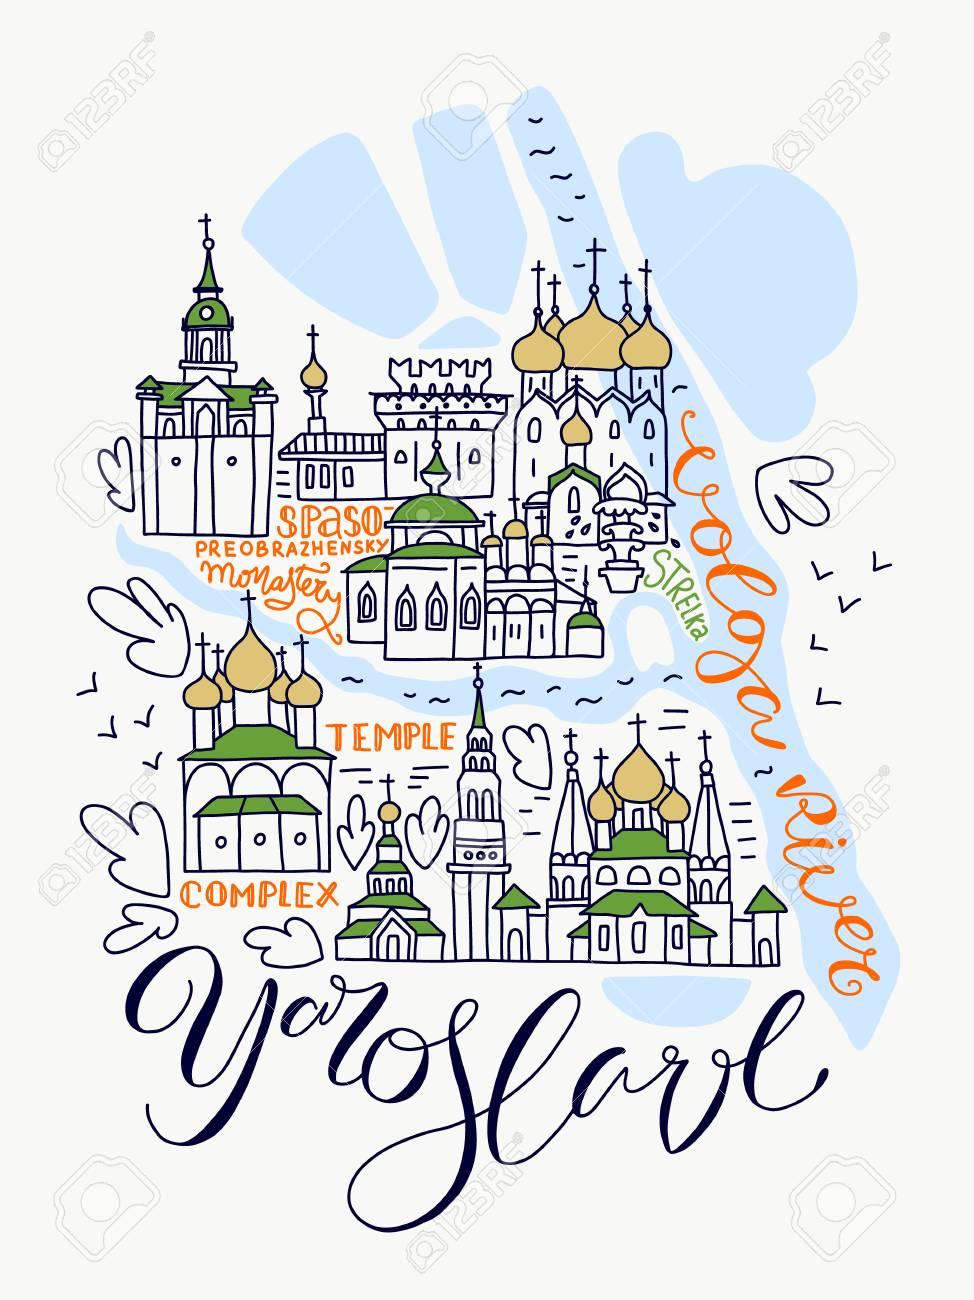 Yaroslavl city - part of Russia on elista russia map, tyumen russia map, mandrogi russia map, saint petersburg, yekaterinburg russia map, zagorsk russia map, altai krai russia map, simferopol russia map, astrakhan russia map, severomorsk russia map, sevastopol russia map, samarkand russia map, uglich russia map, tallinn russia map, murmansk russia map, lokomotiv yaroslavl, lake baikal, nizhny novgorod, yurga russia map, tuva russia map, kalmykia russia map, krasnogorsk russia map, sarajevo russia map,